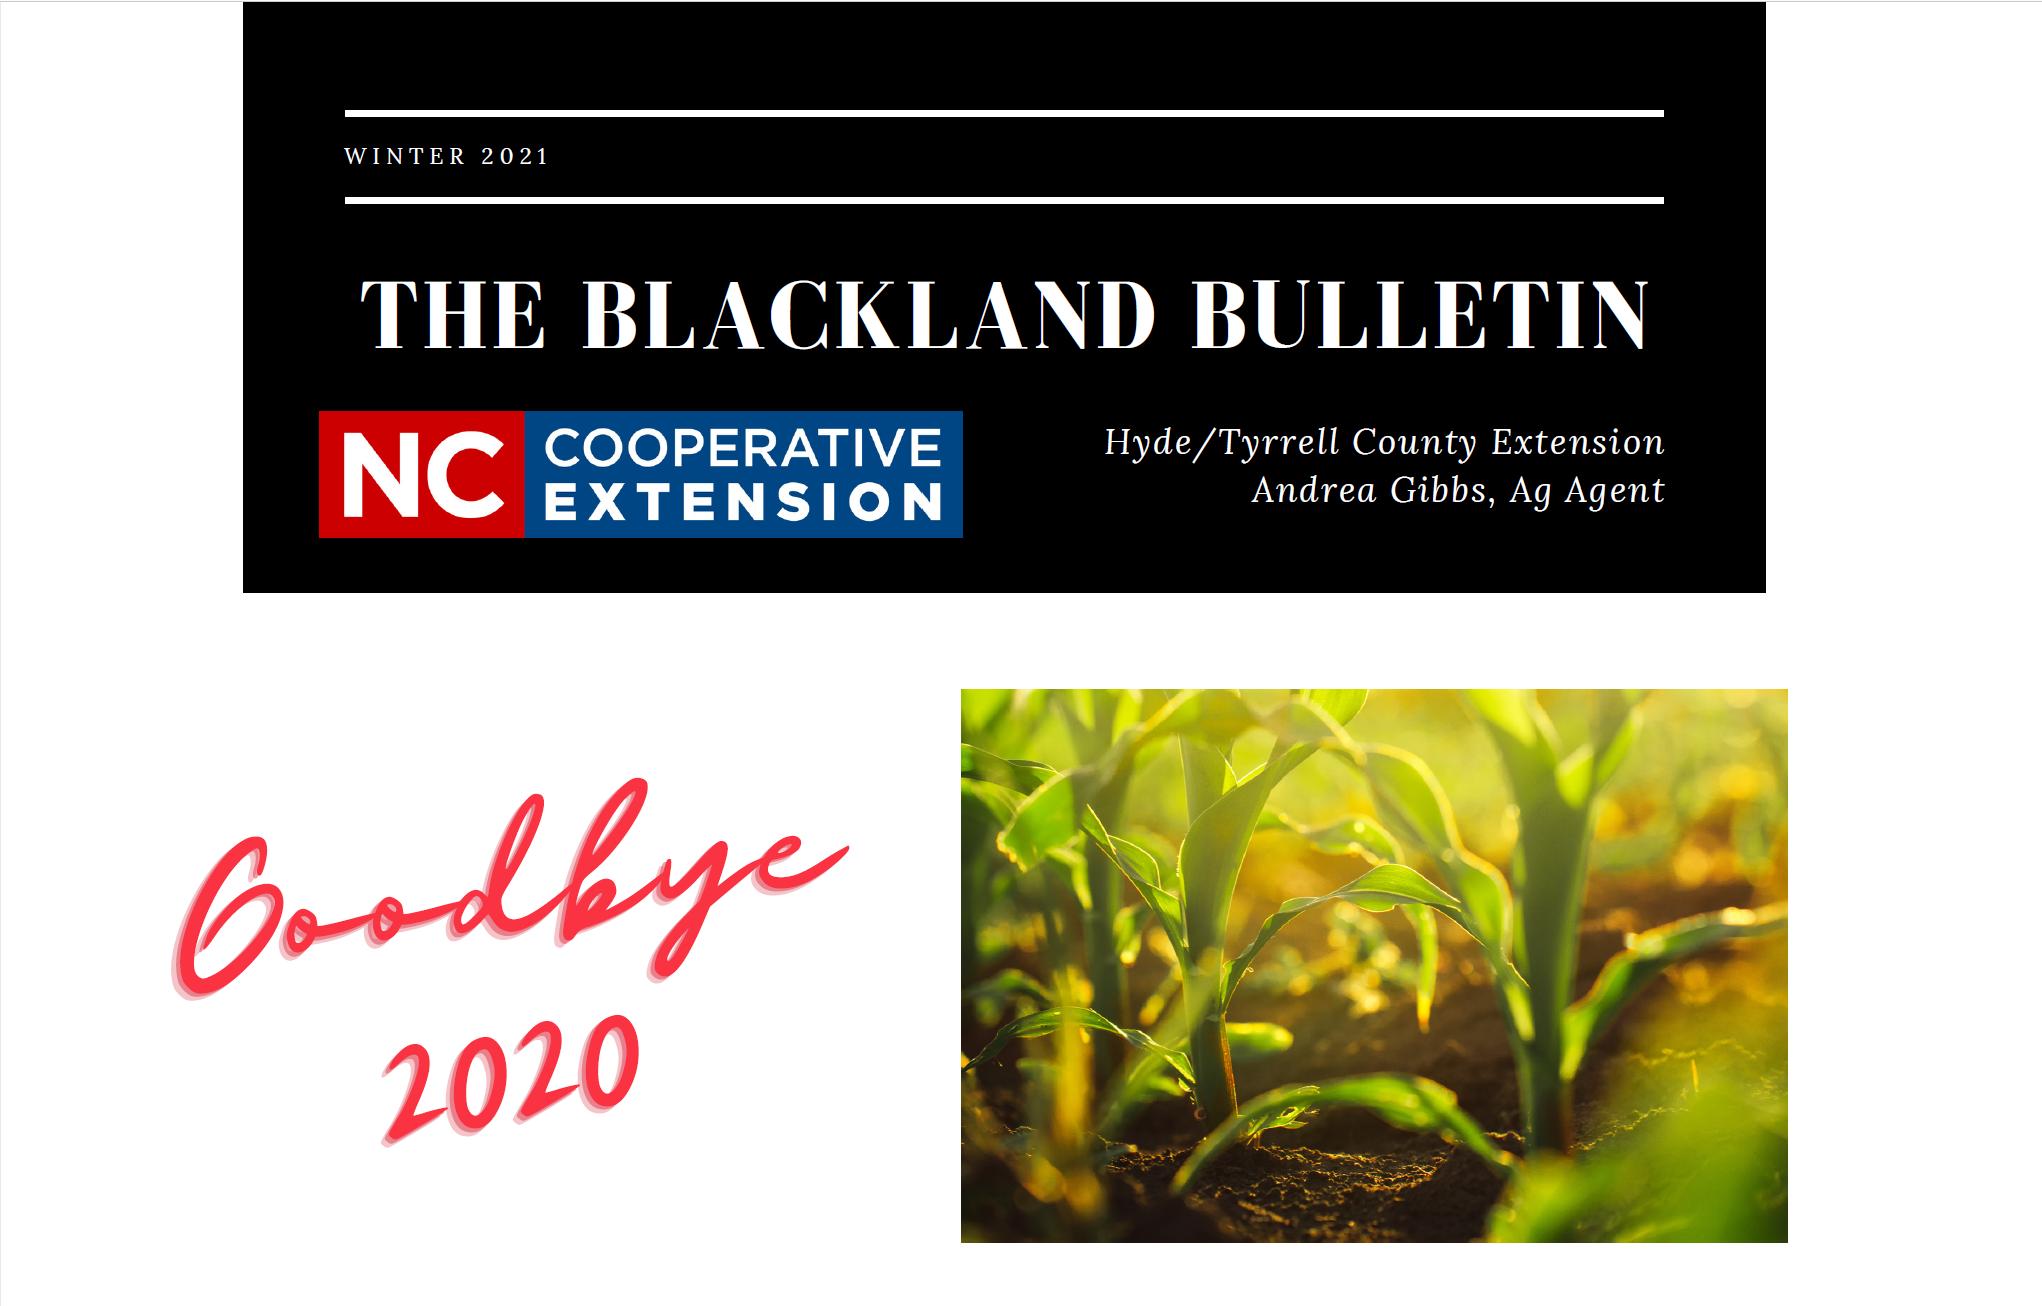 Blackland Bulletin header image